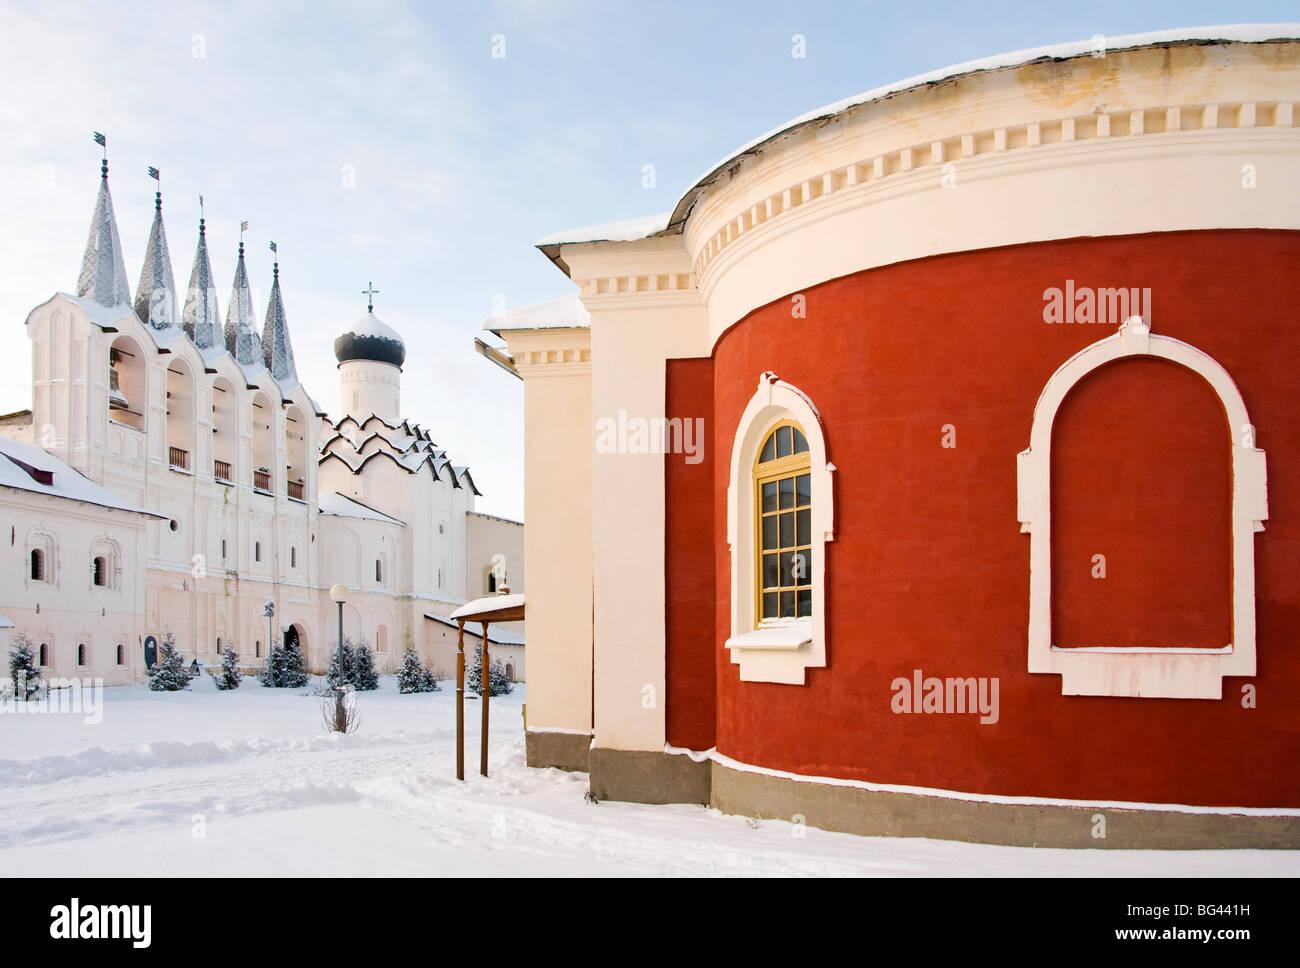 Bogorodichno-Uspenskij Monastery in winter, Tikhvin, Leningrad region, Russia - Stock Image